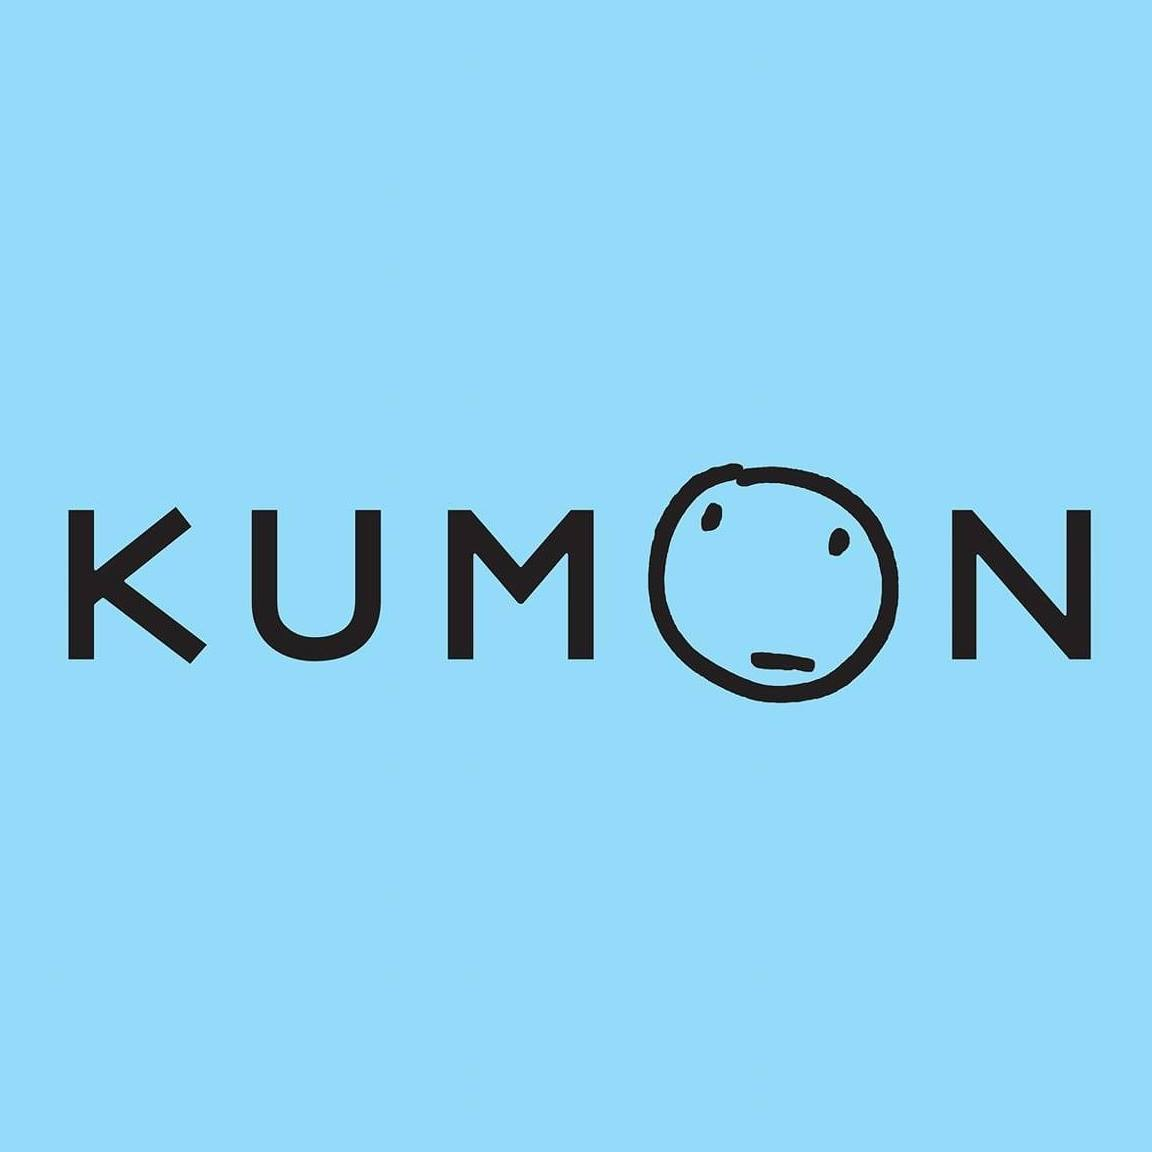 Kumon Daventry Study Centre's logo